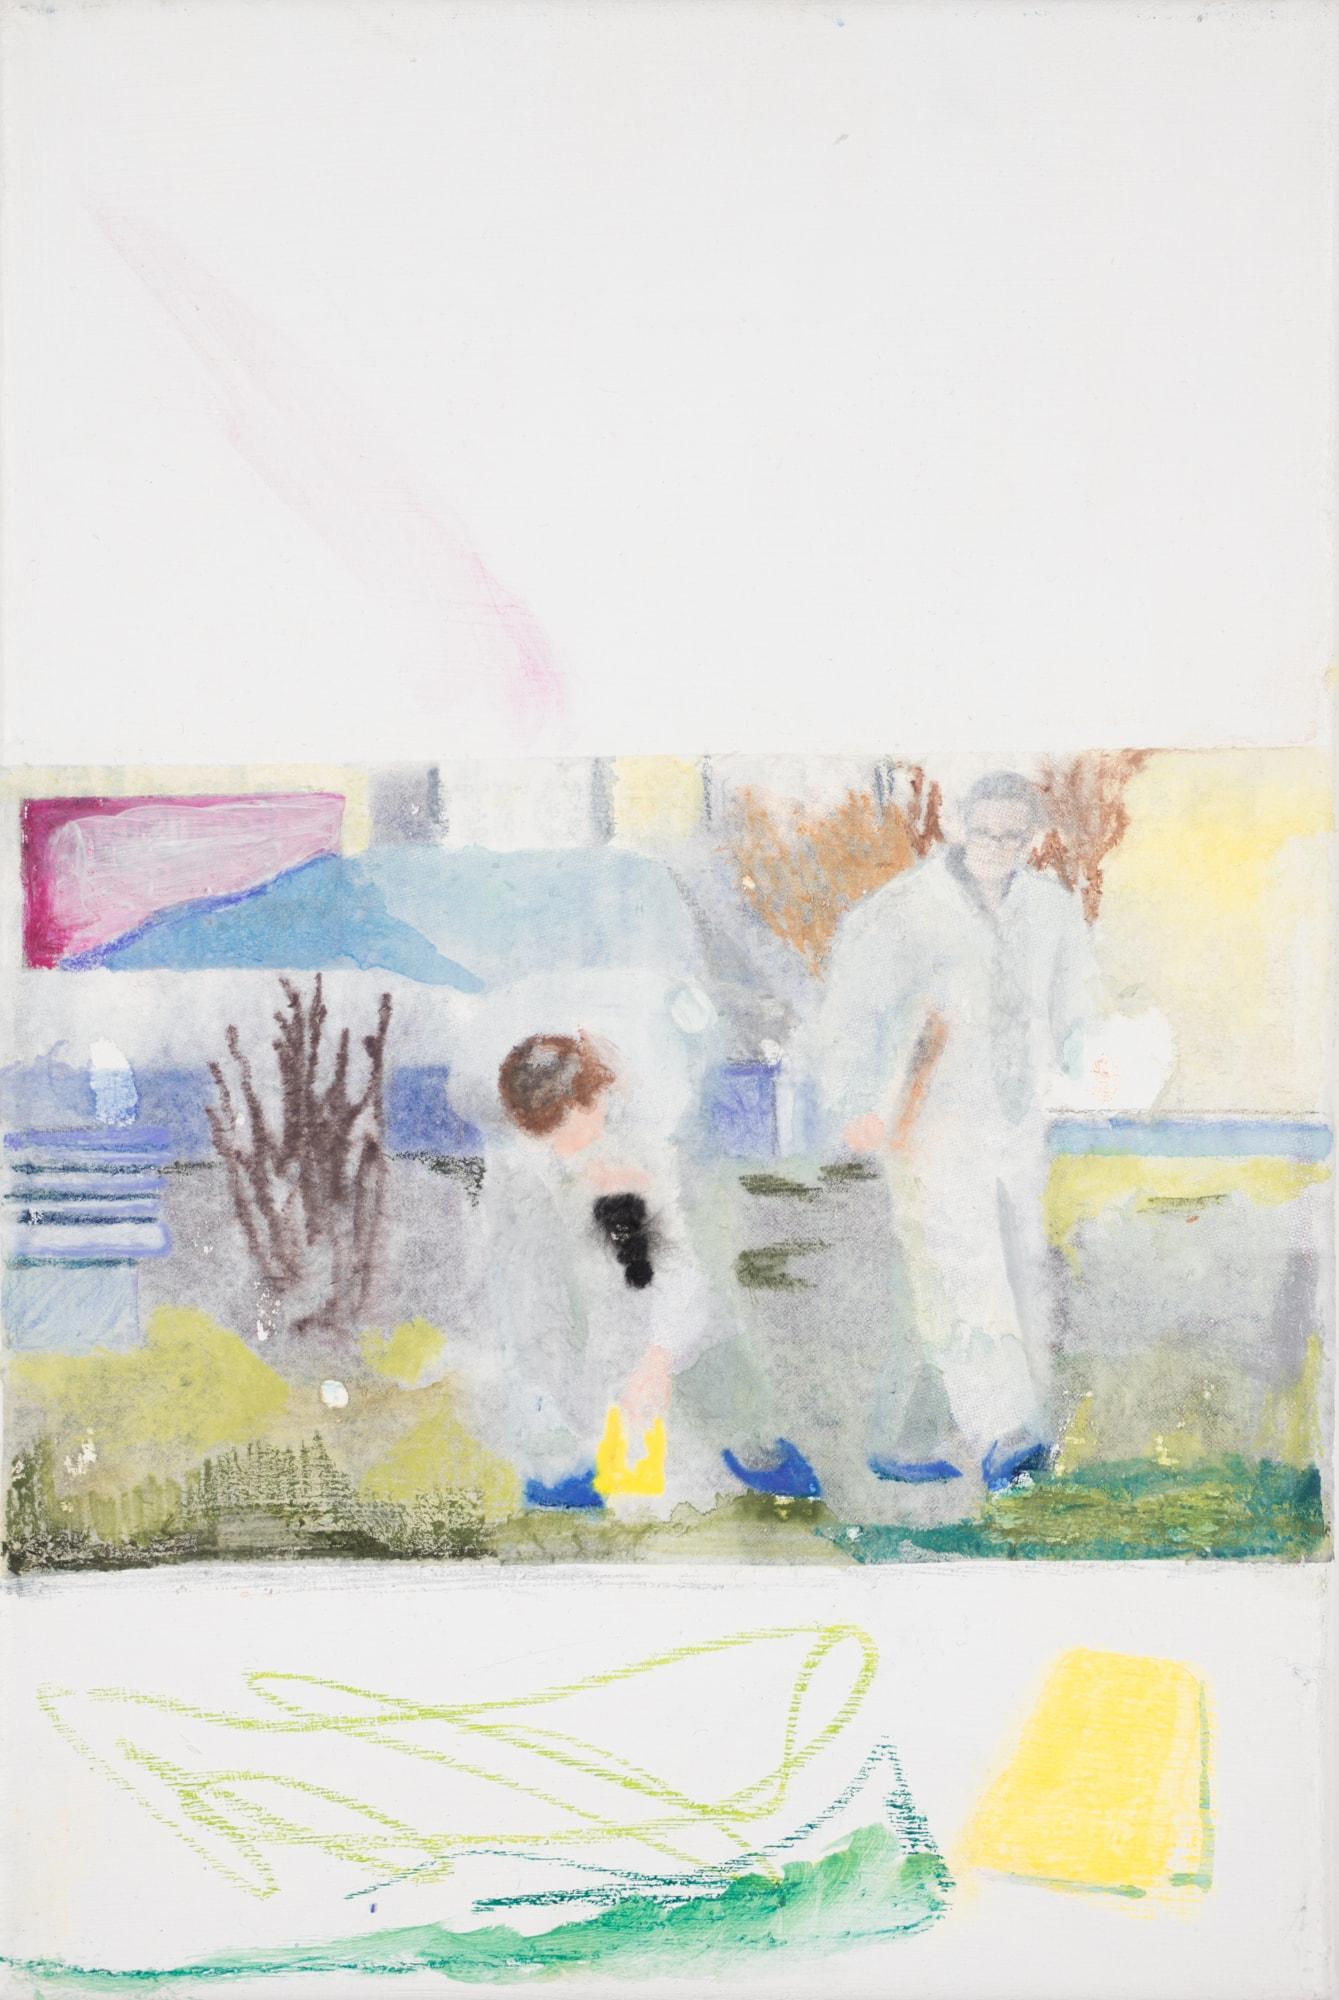 Malerei, Öl auf Leinwand, 20x30cm, Spurensicherung, Künstlerin: Franziska King